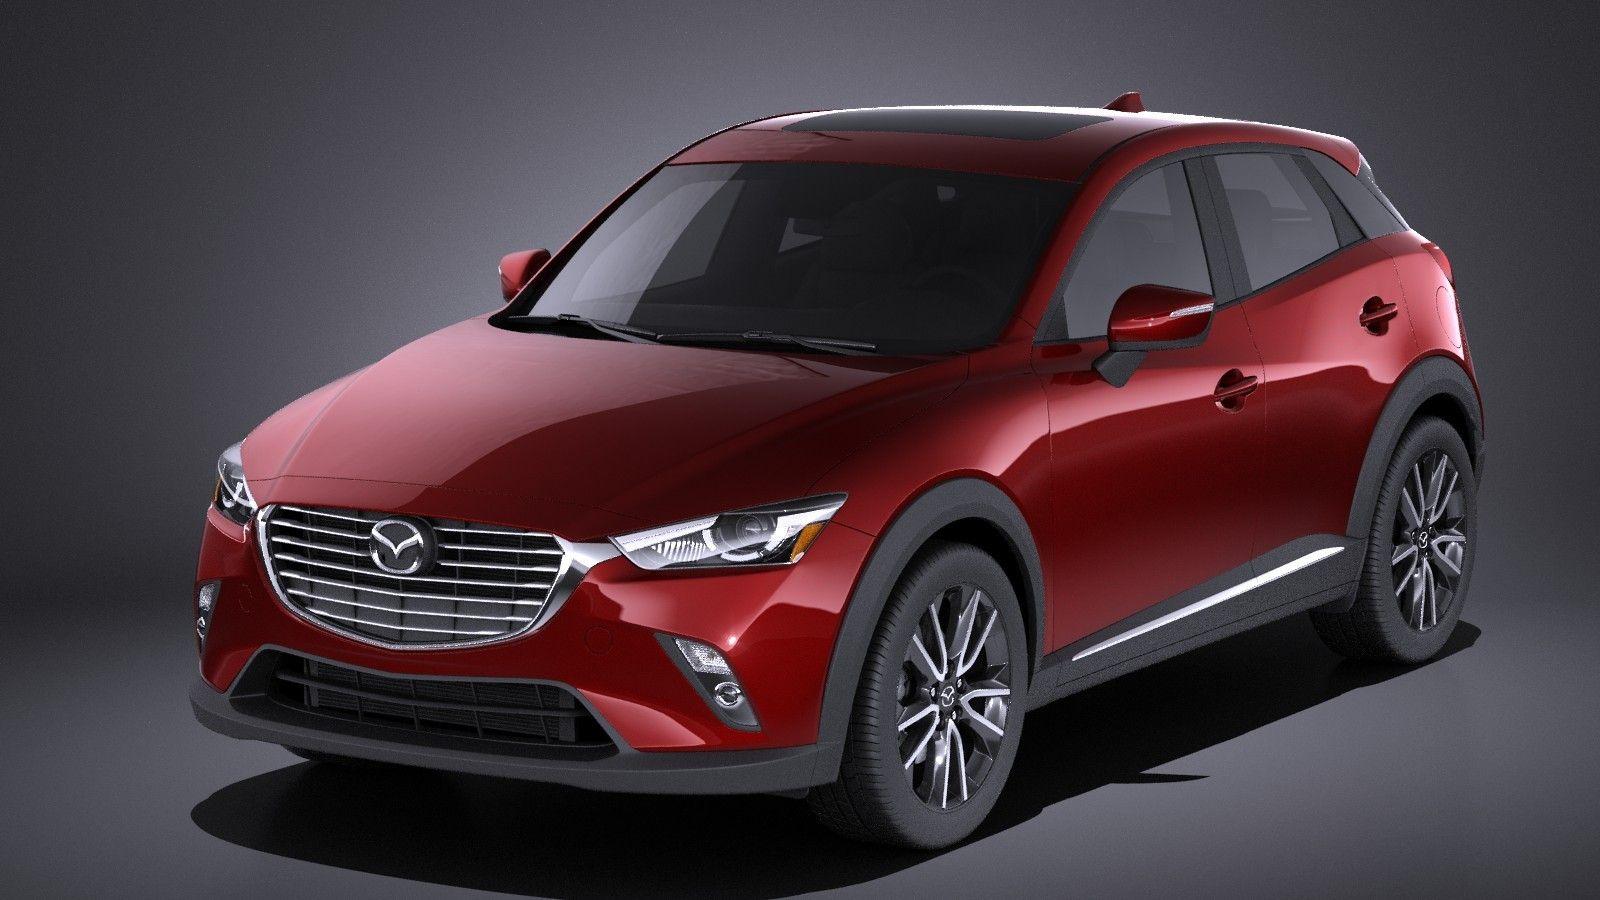 Kelebihan Mazda Cx 3 4X4 Harga